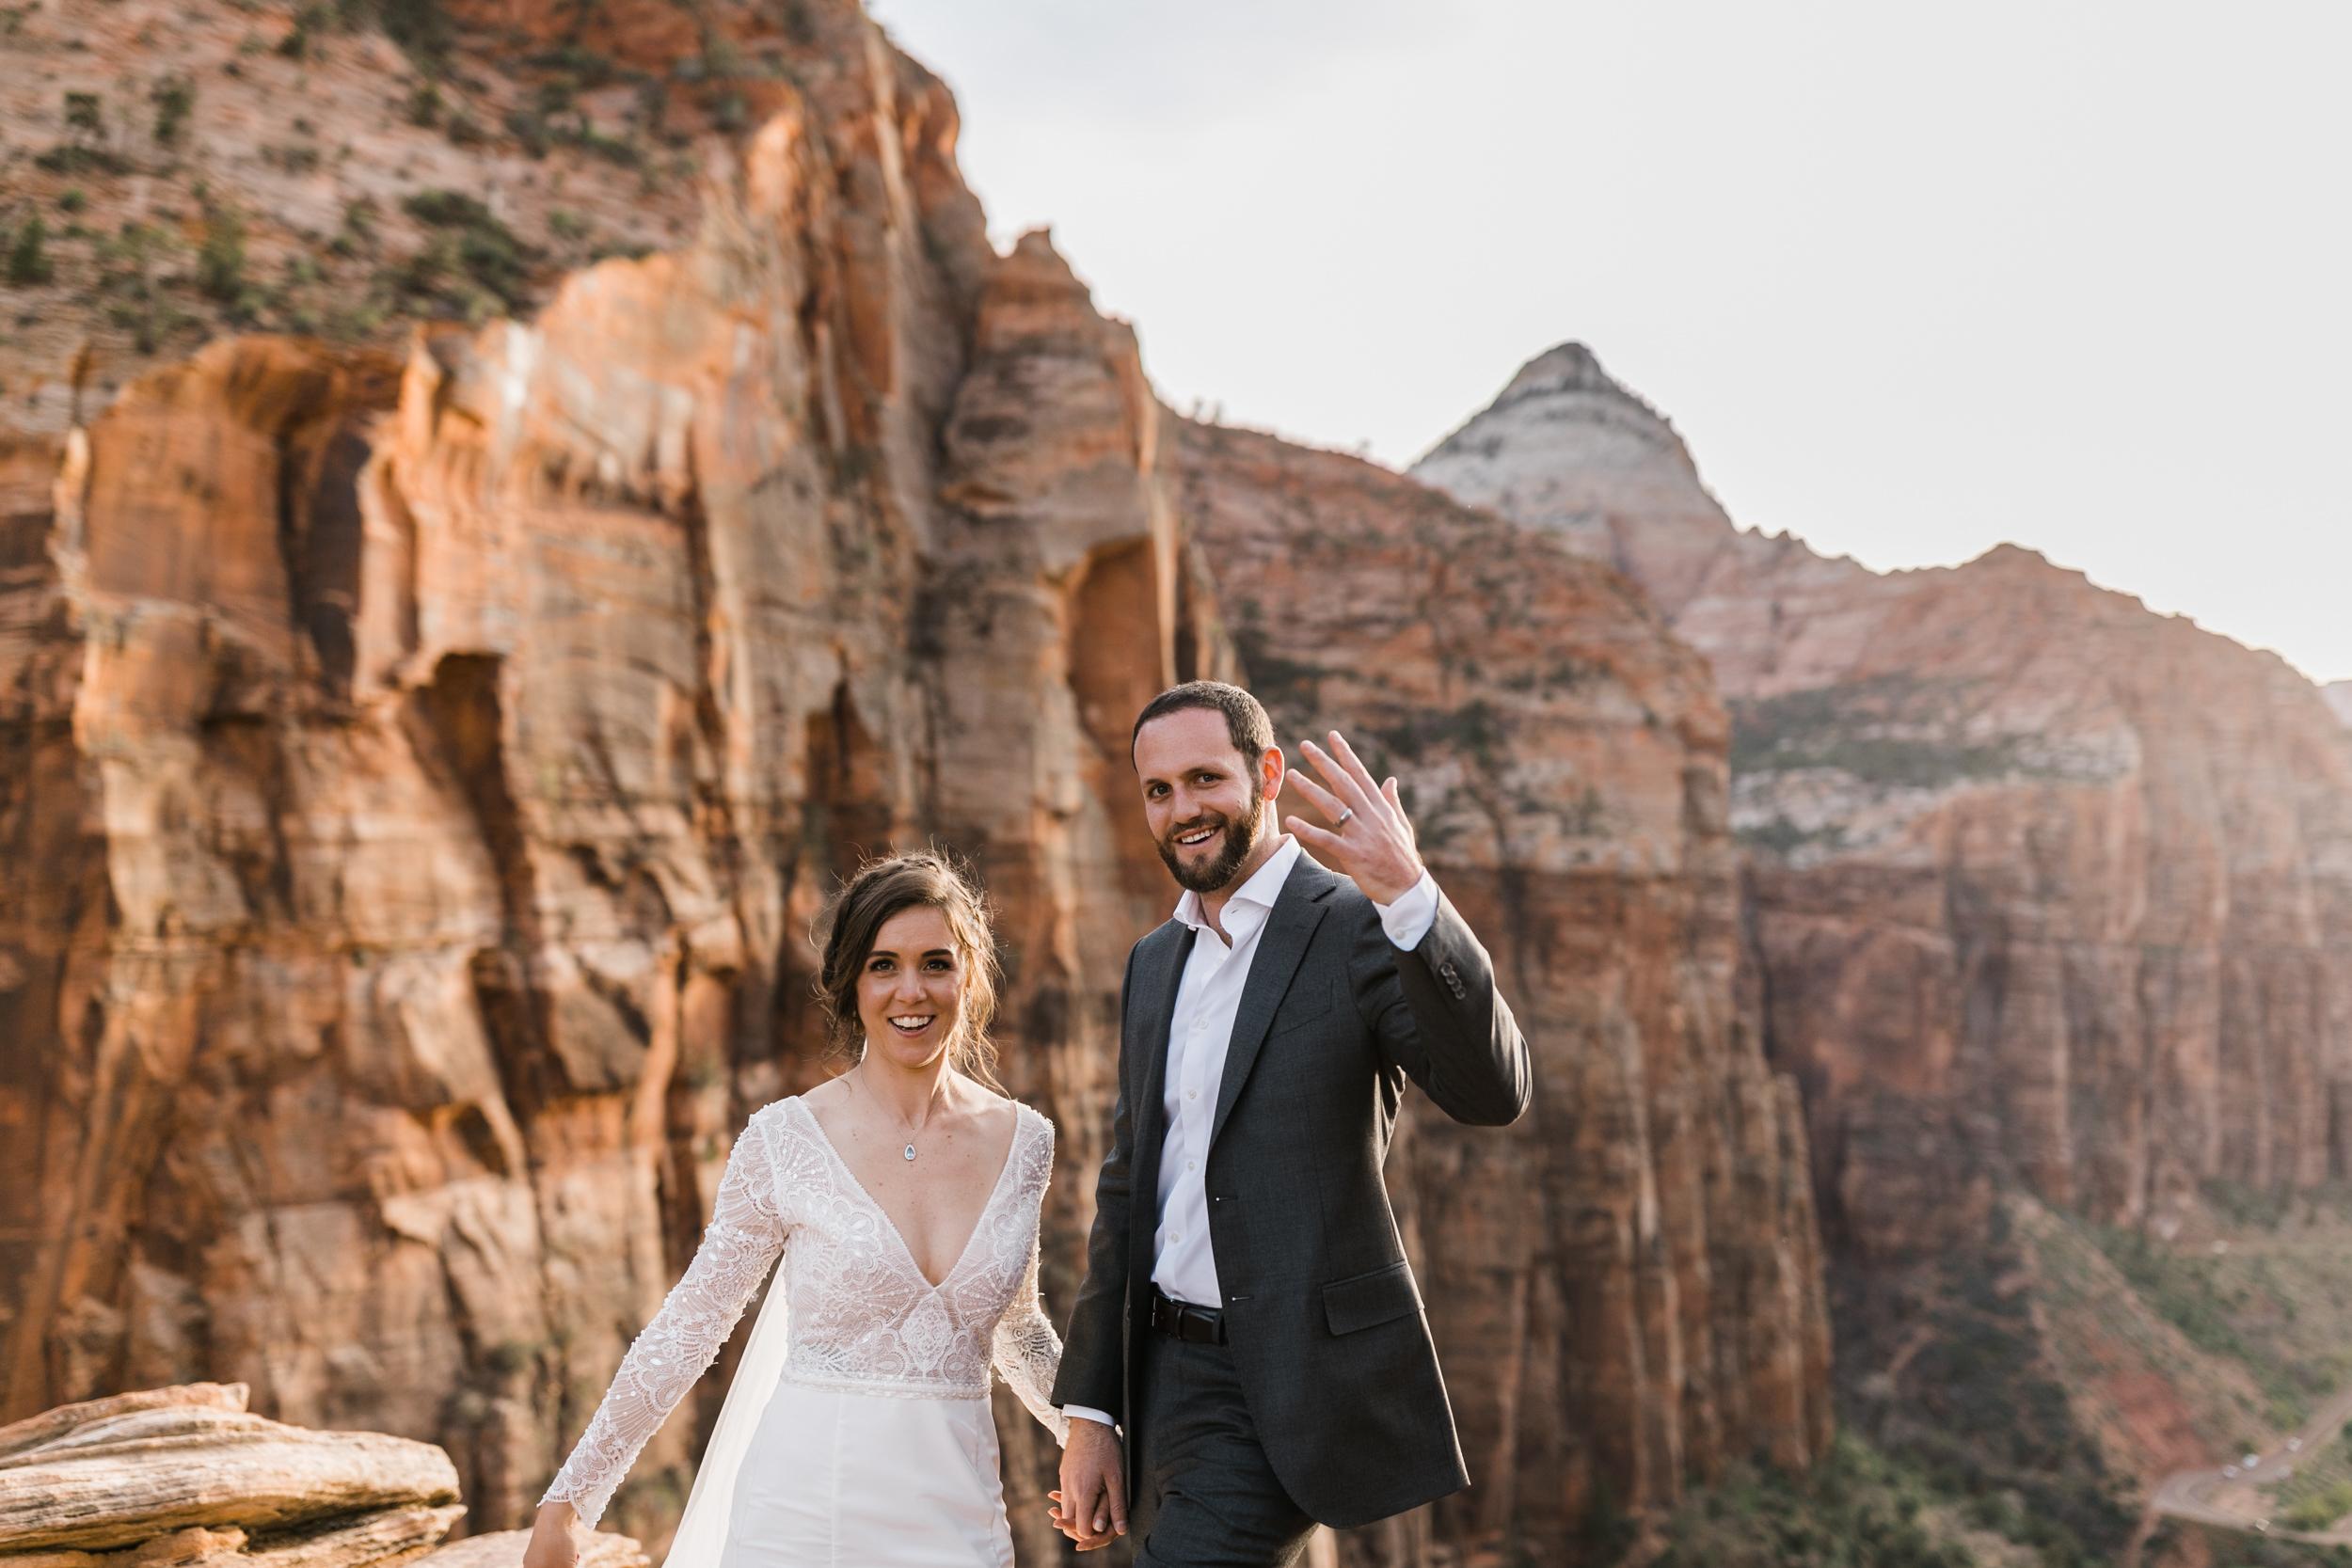 Zion-National-Park-Adventure-Wedding-Hearnes-Elopement-Photography-36.jpg